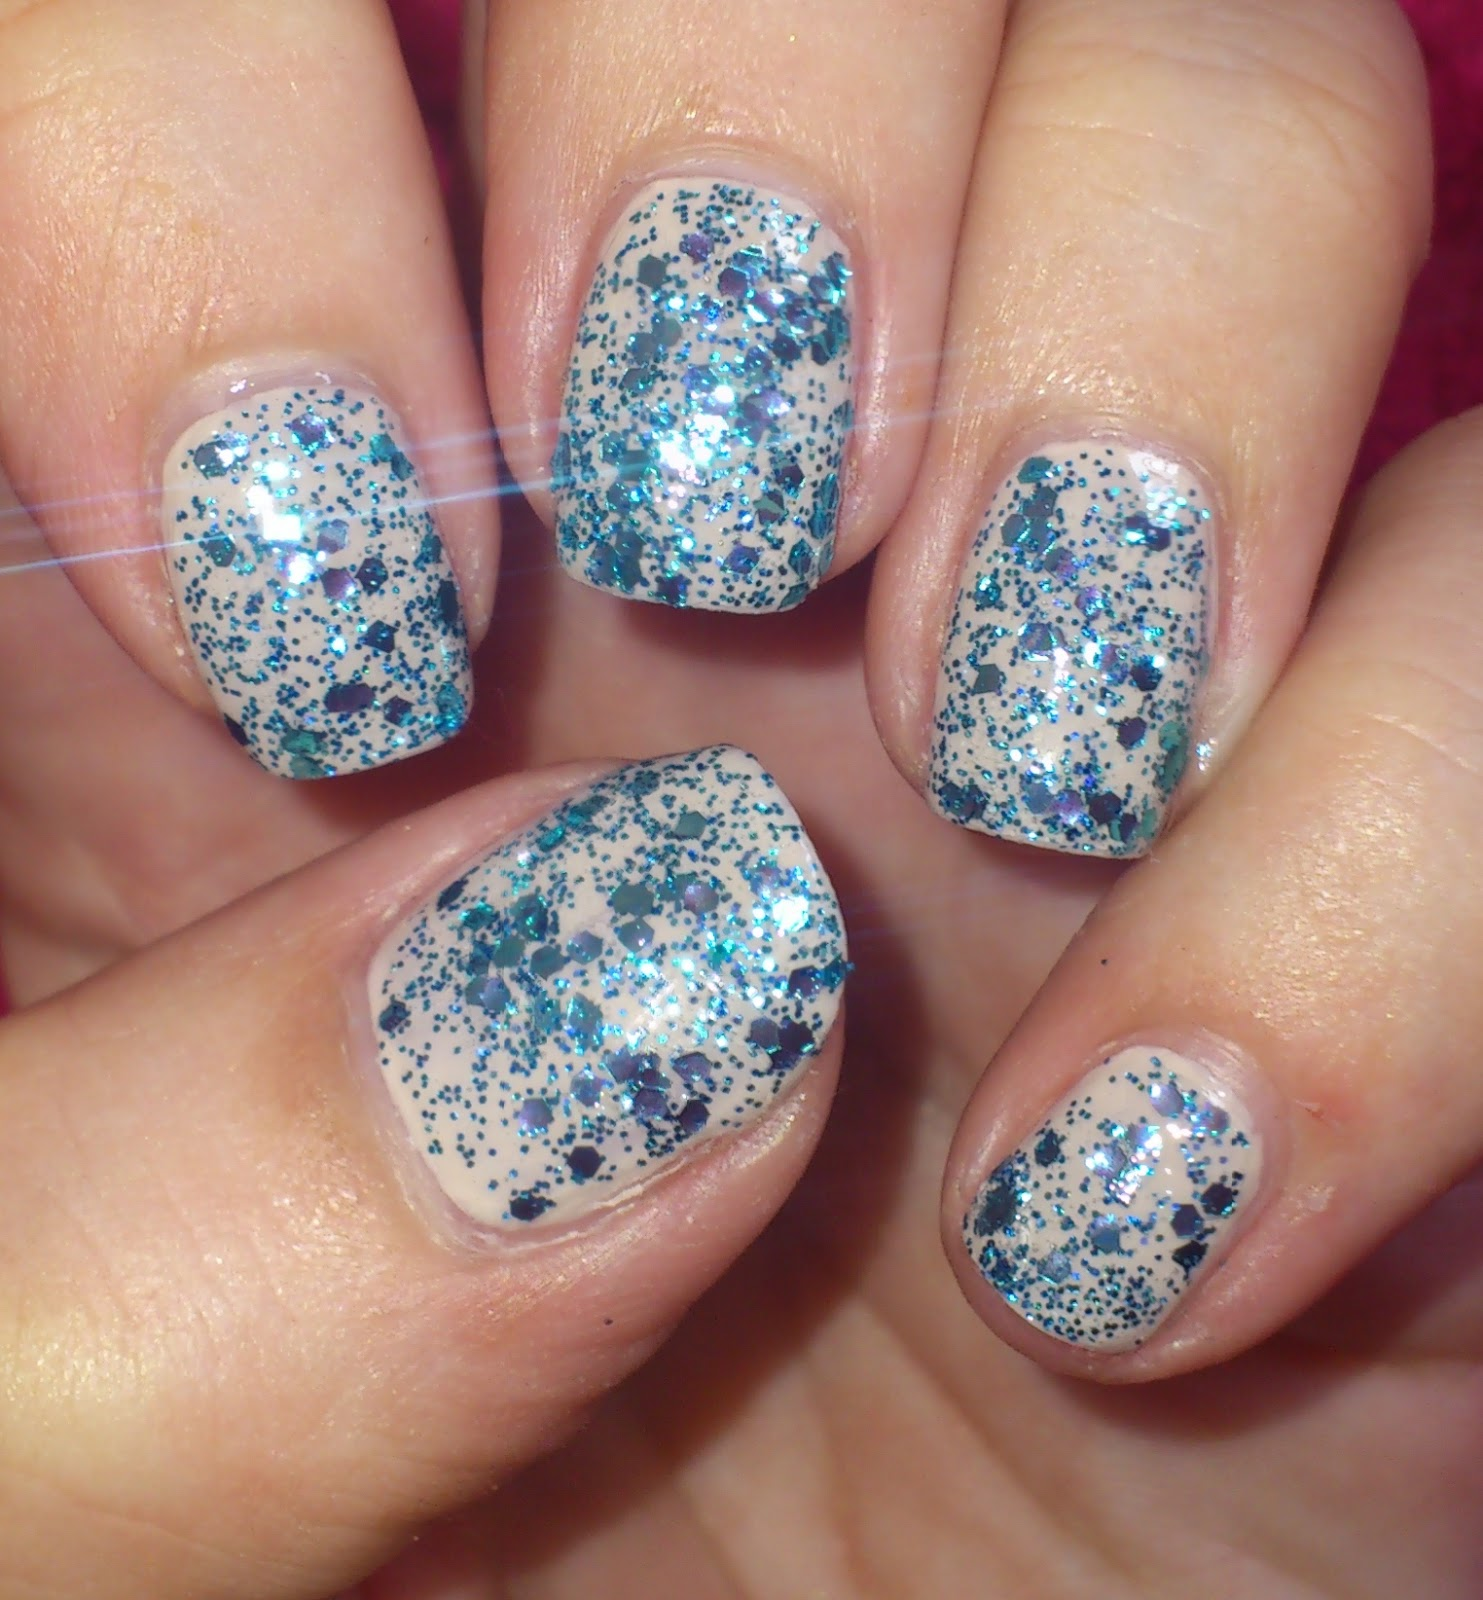 Blue Nail Varnish Uk: Wendy's Delights: Tmart Glitter Nail Polish